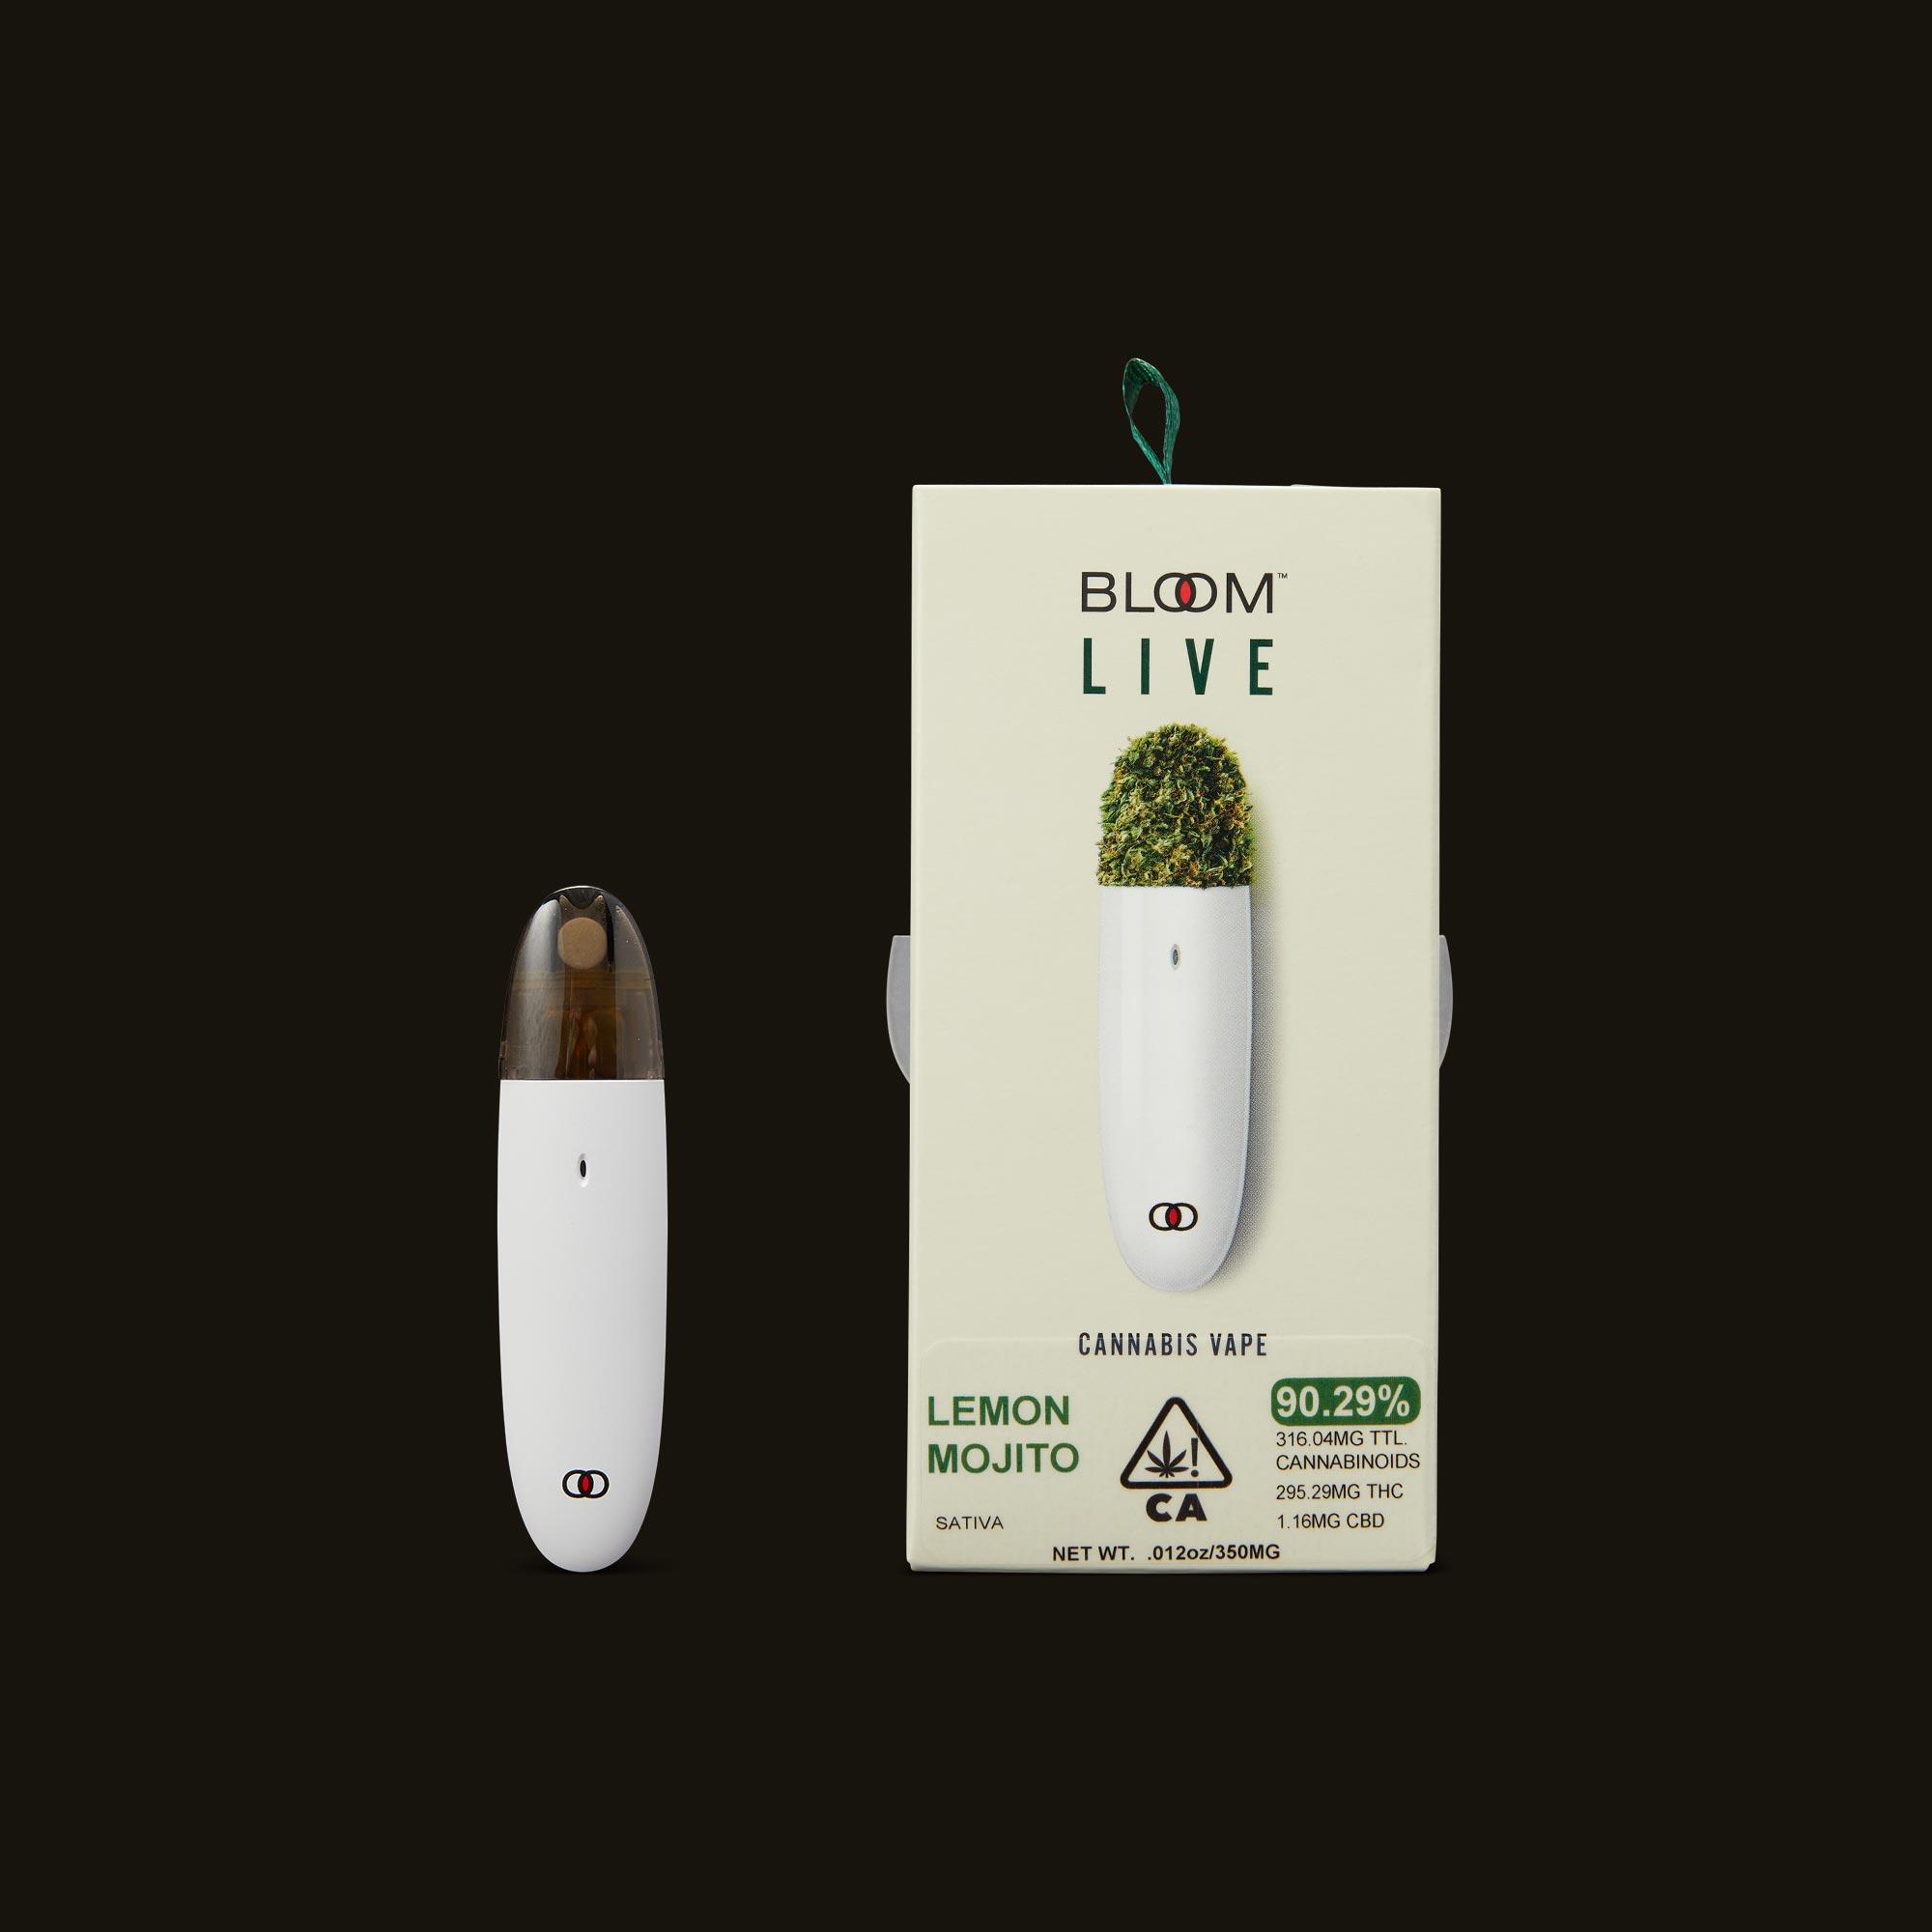 Bloom Brands Lemon Mojito Live Surf Disposable